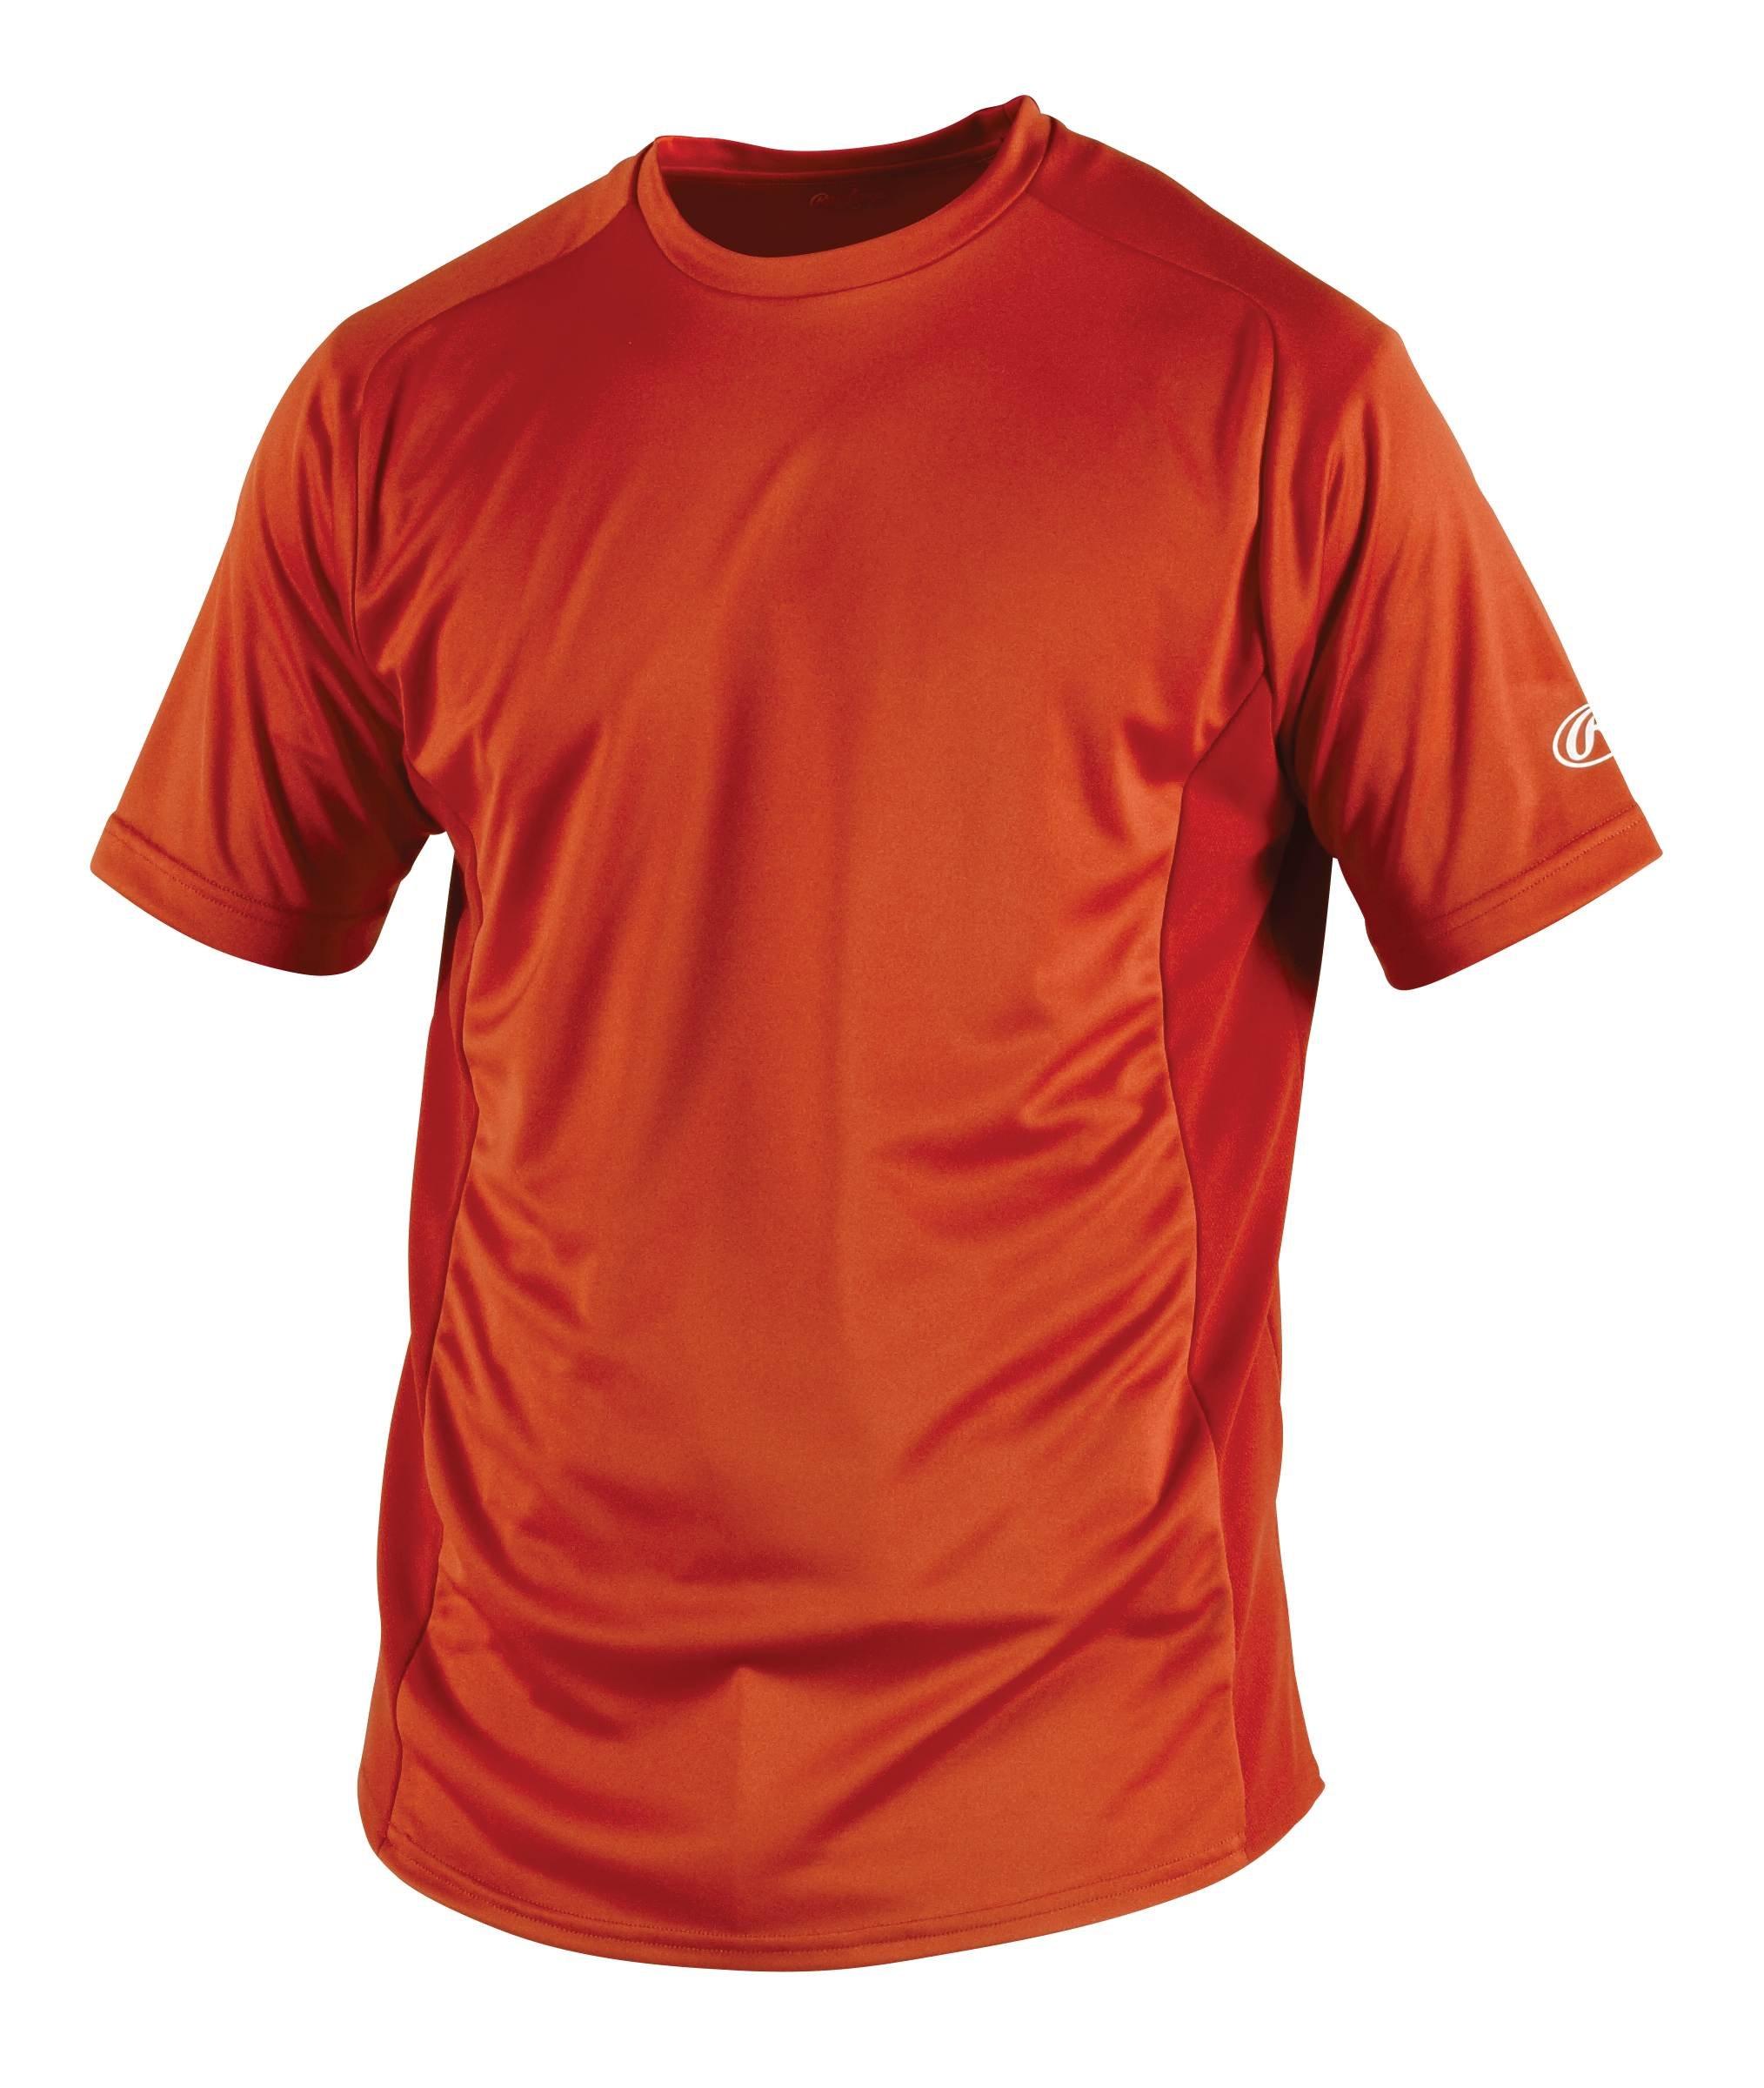 Rawlings Men's Short Sleeve Baselayer Shirt, Burnt